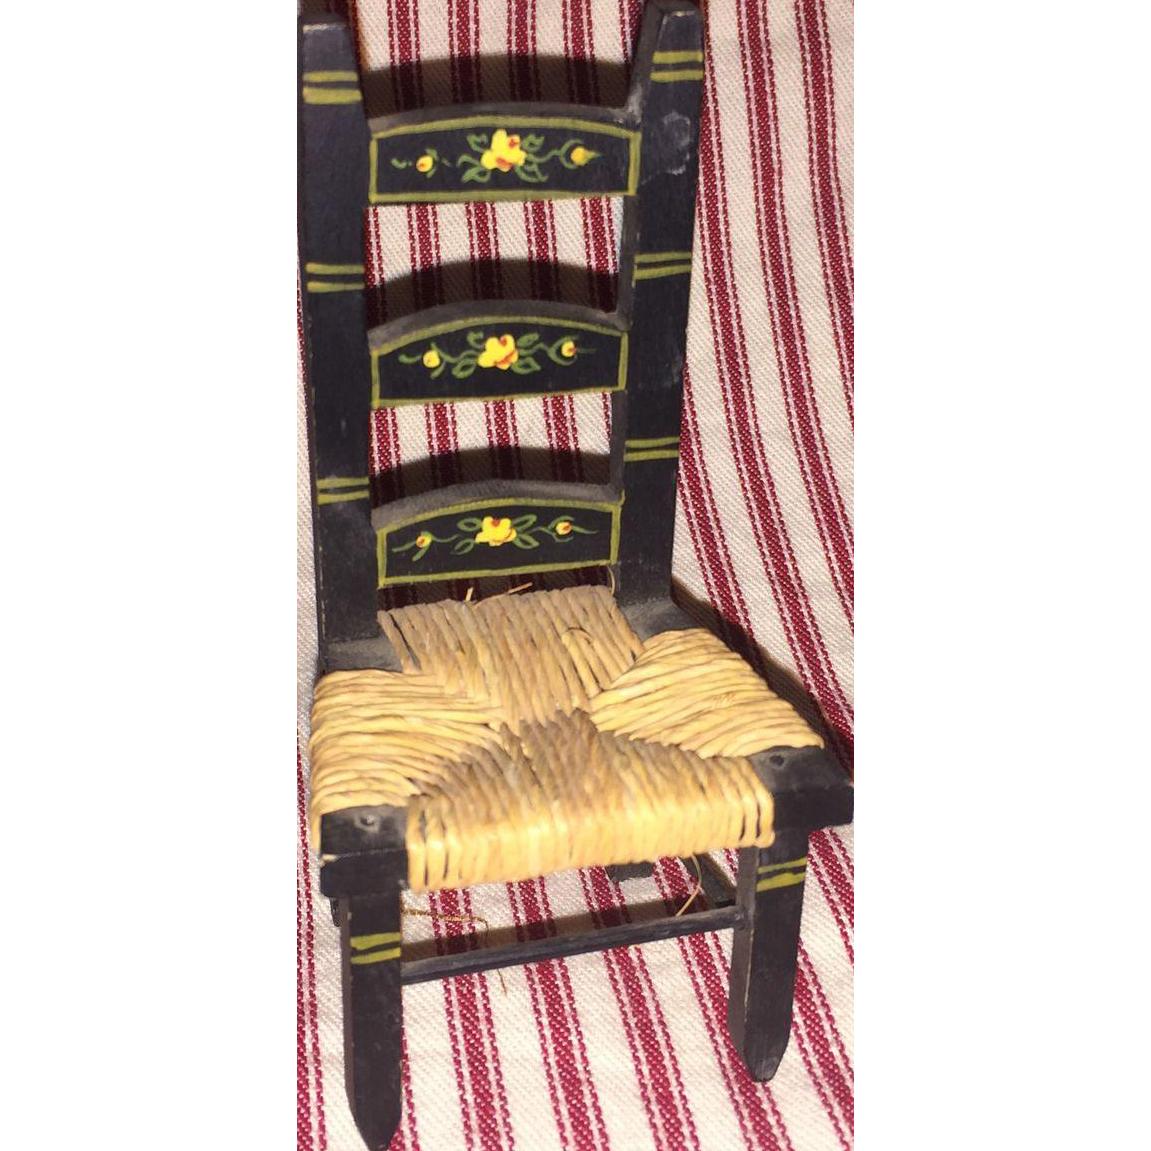 Tynietoy PInted Rush Seat Dollhouse Miniature Chair